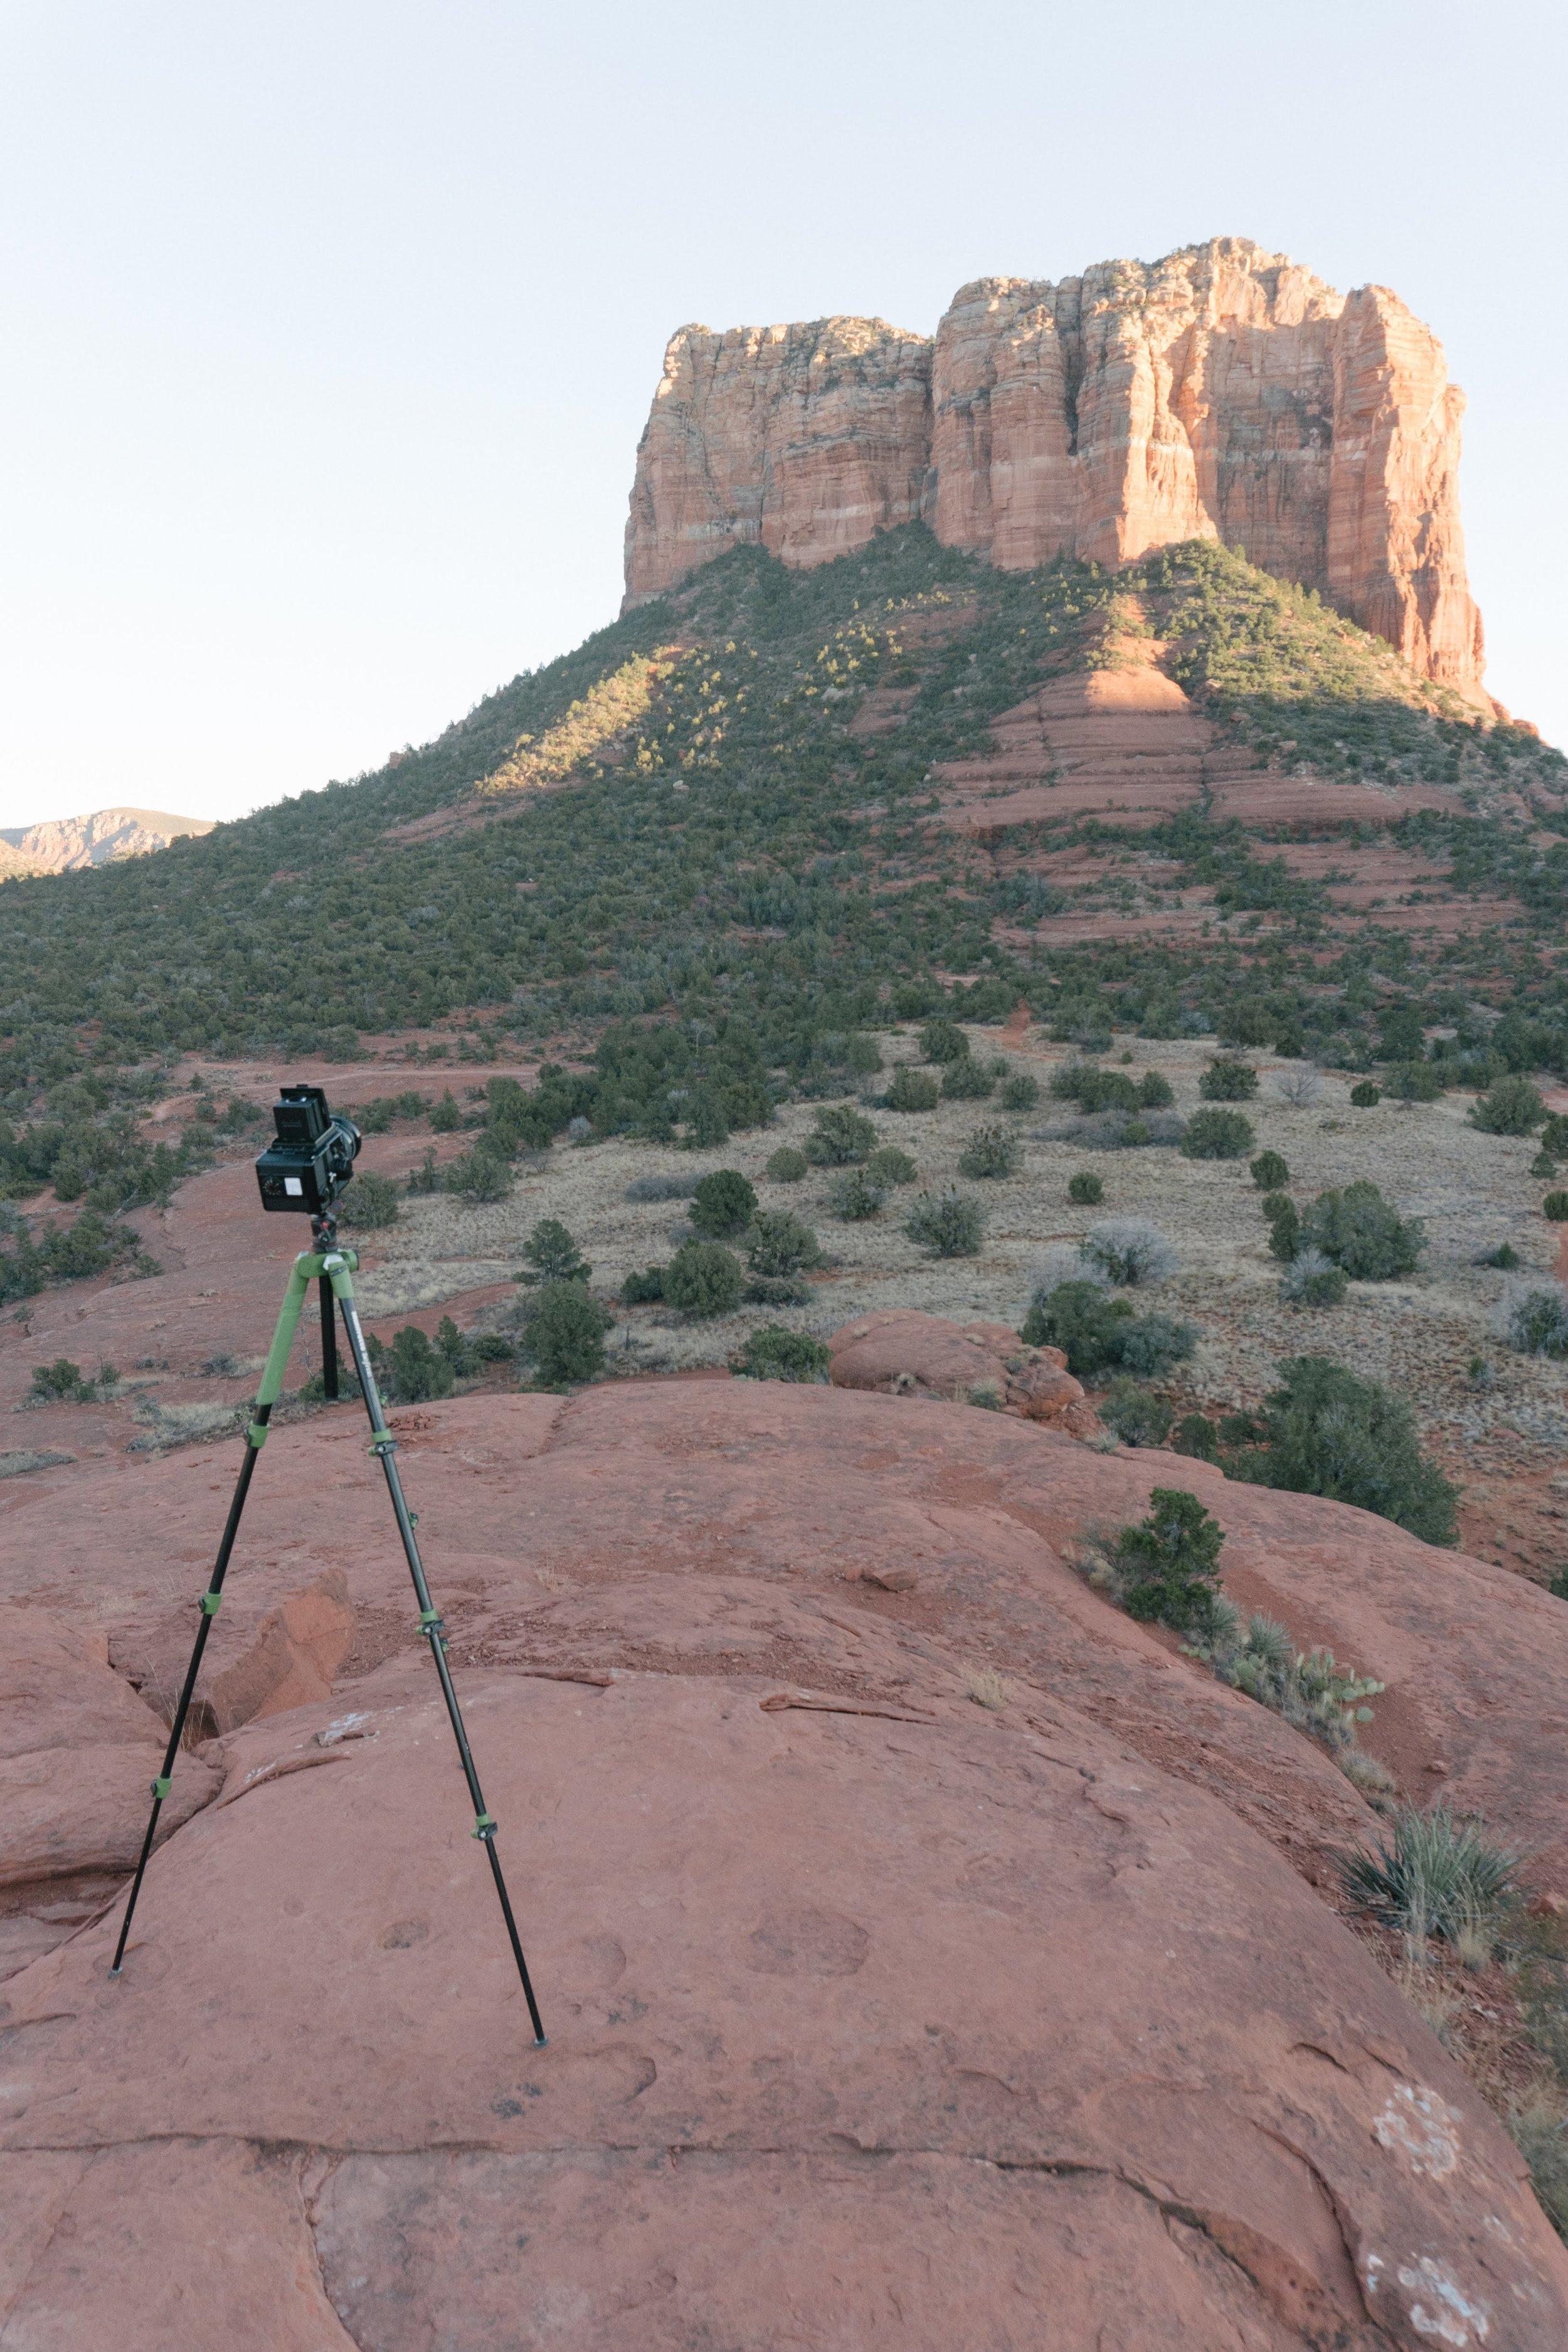 Rocks formations of the South West, Sedona, Arizona